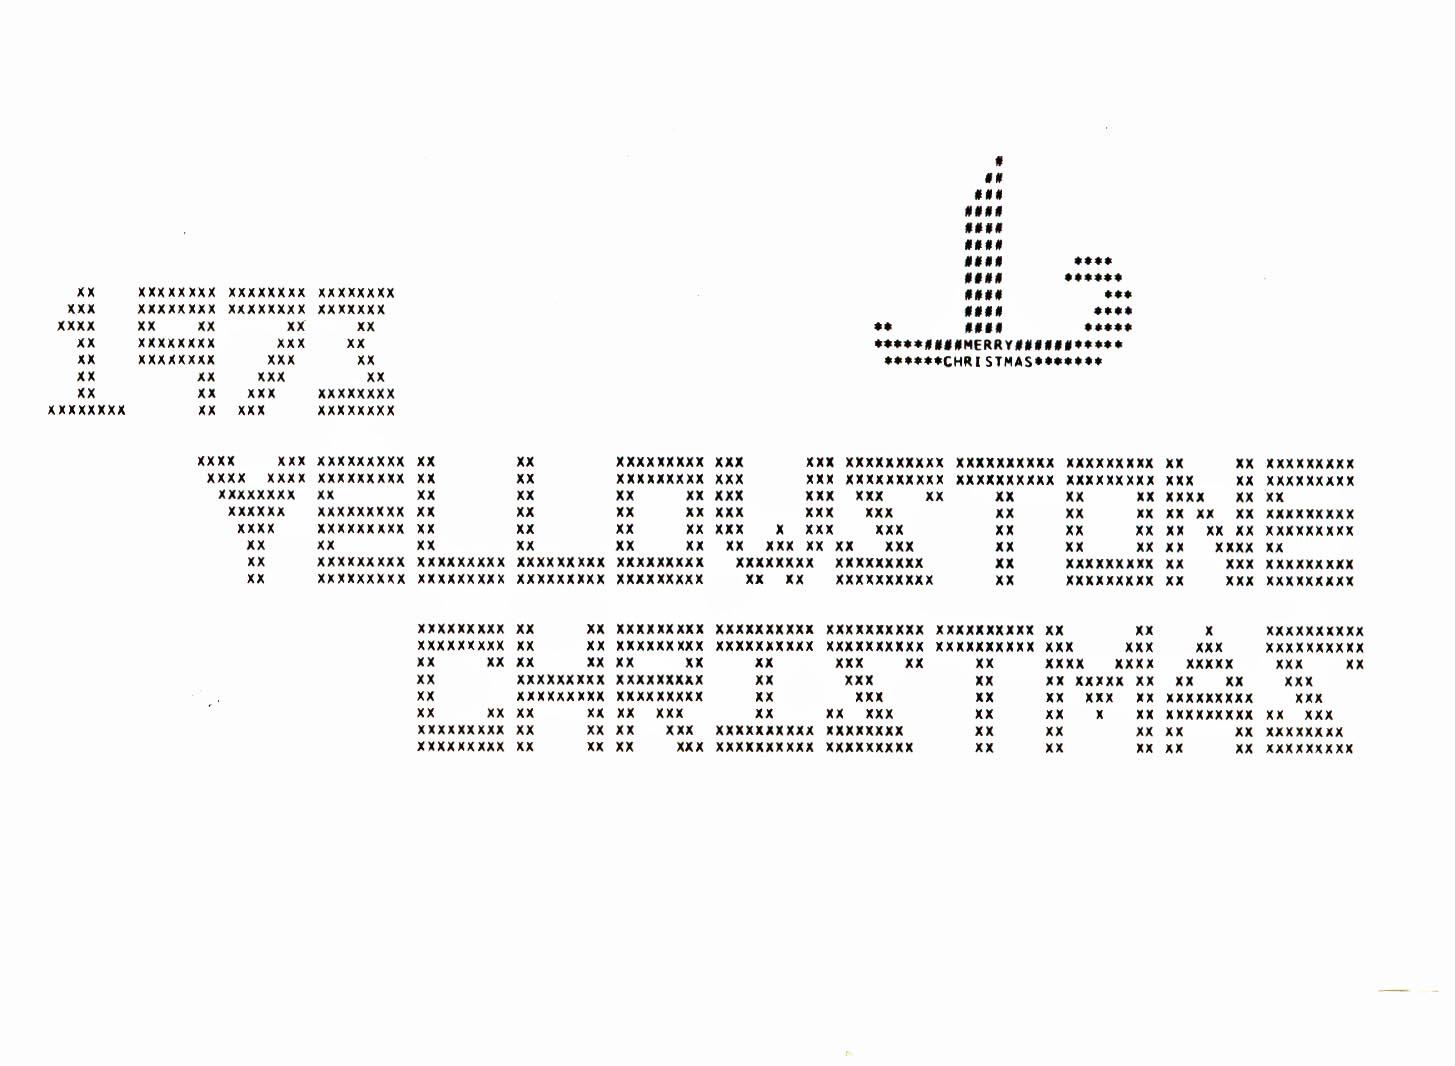 YP Christmas Keypunch 1